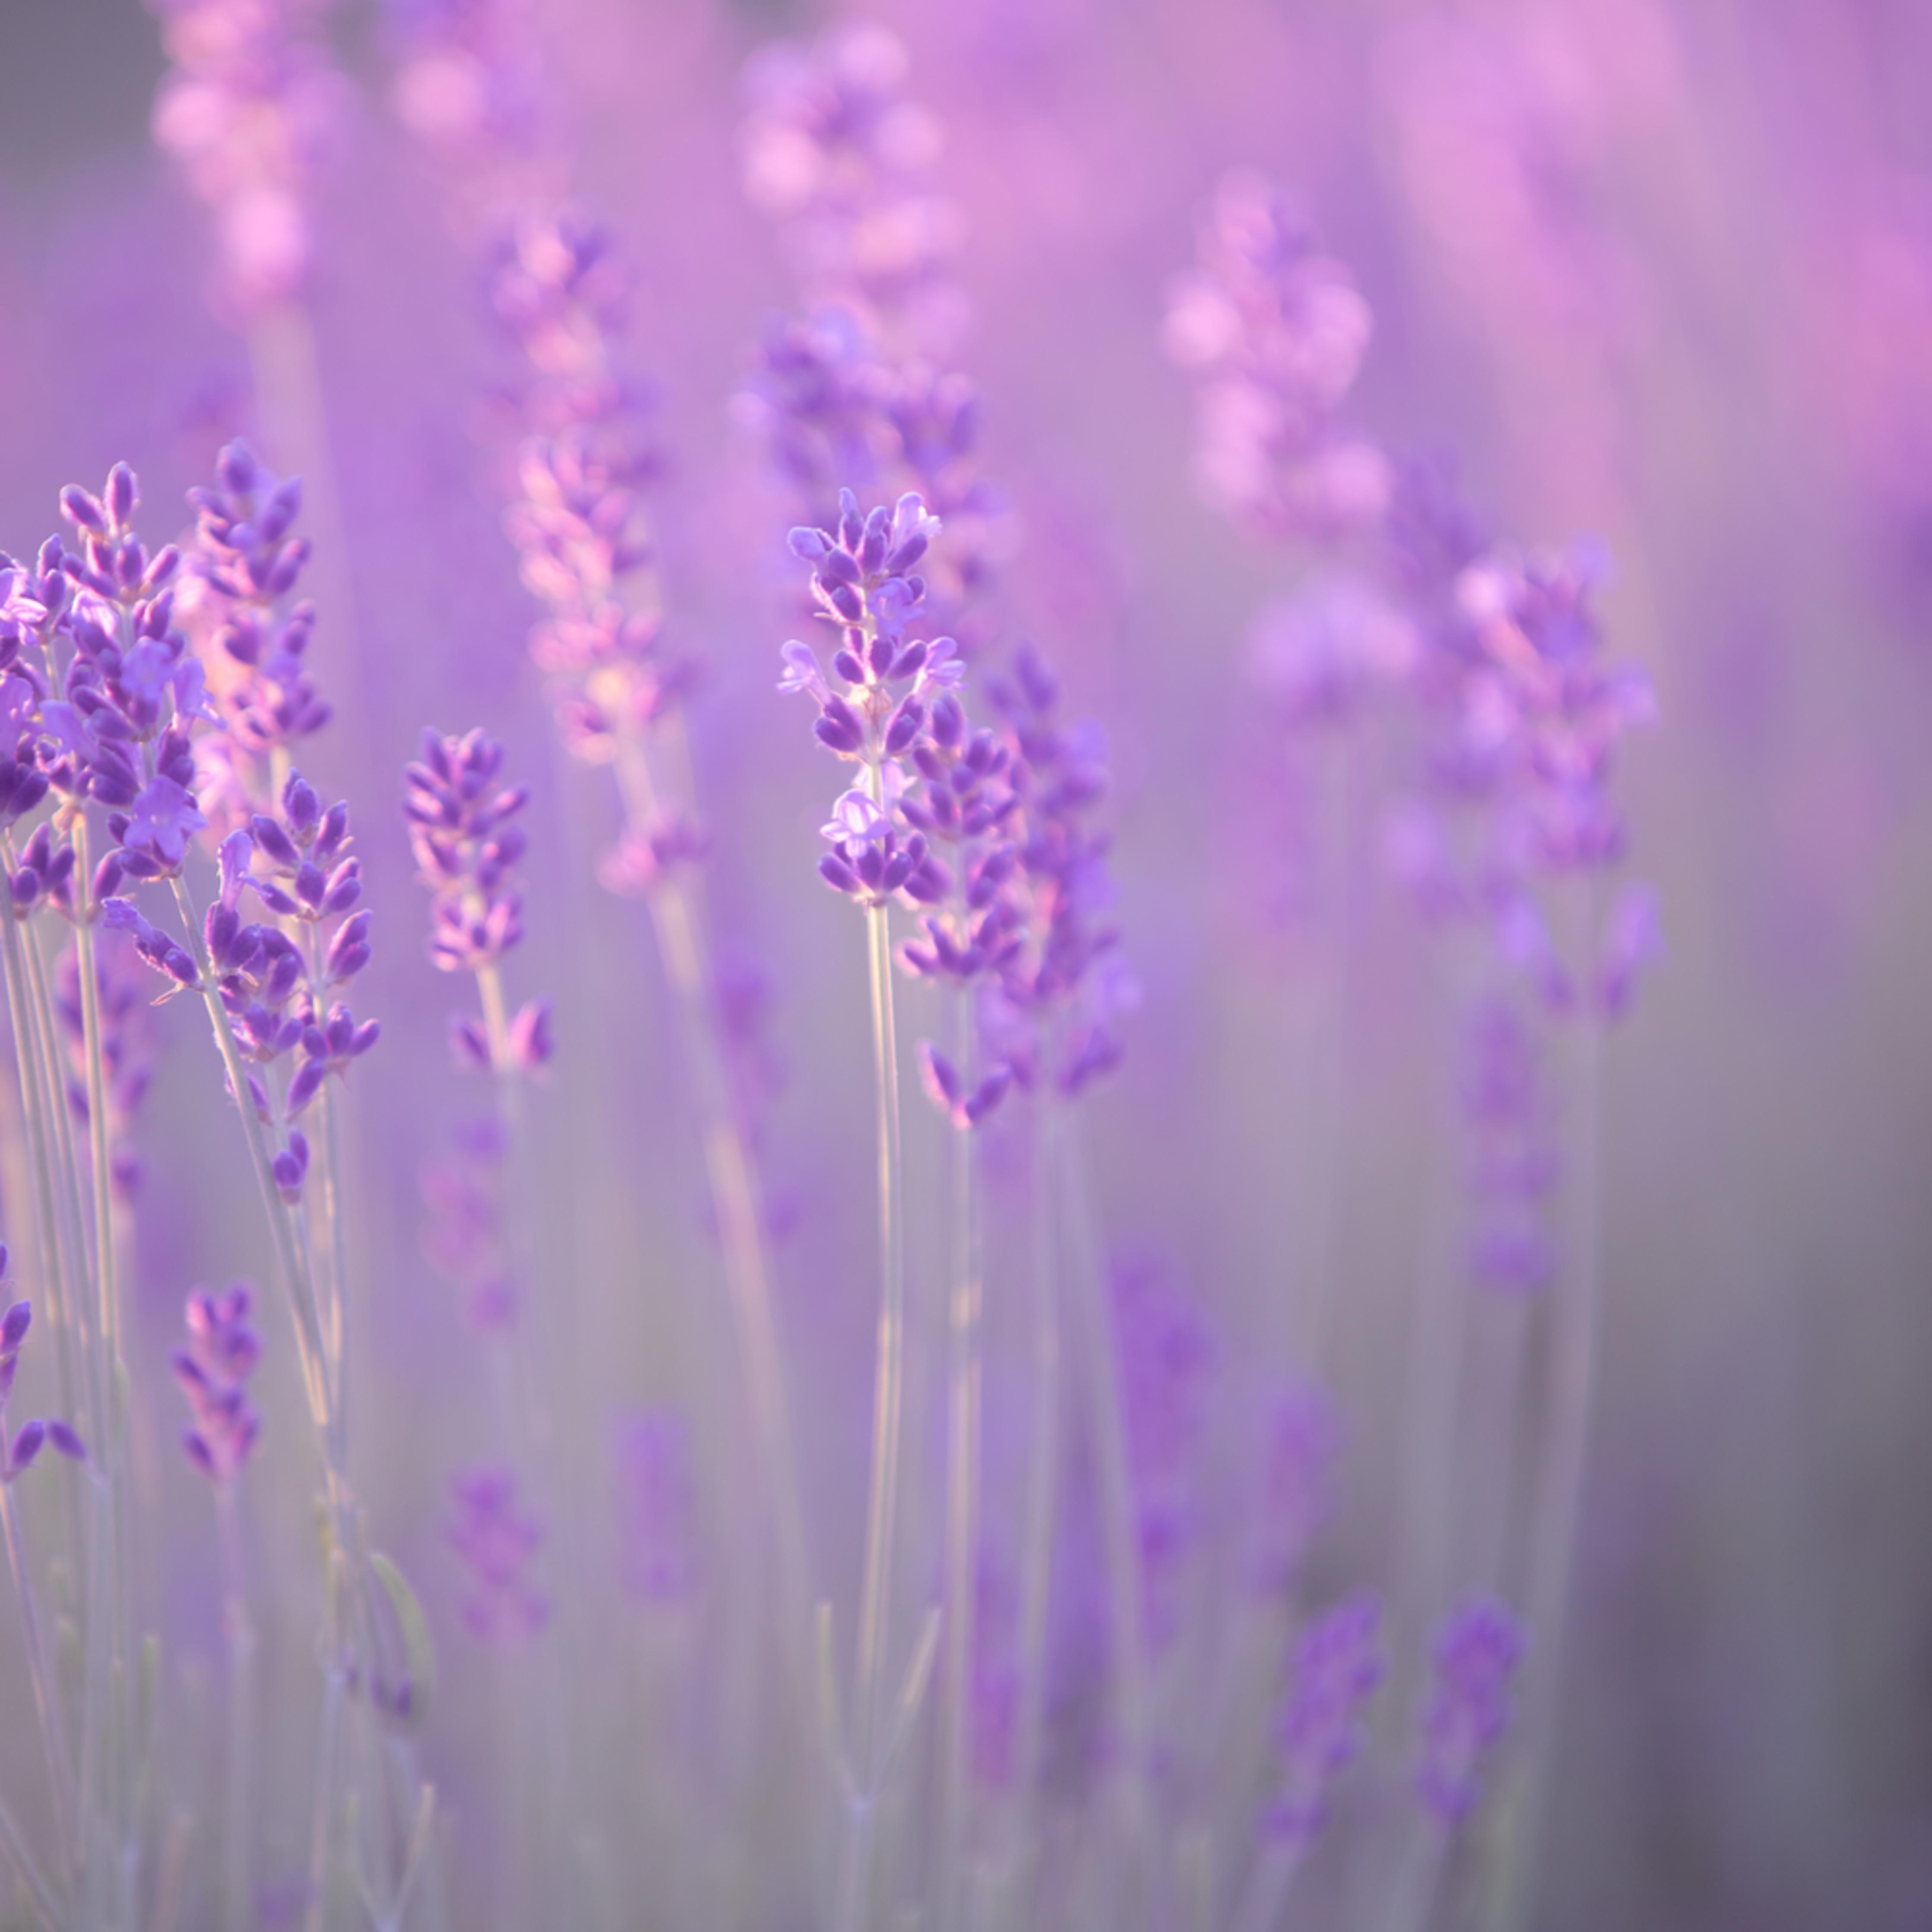 Lavender breeze k8bewu